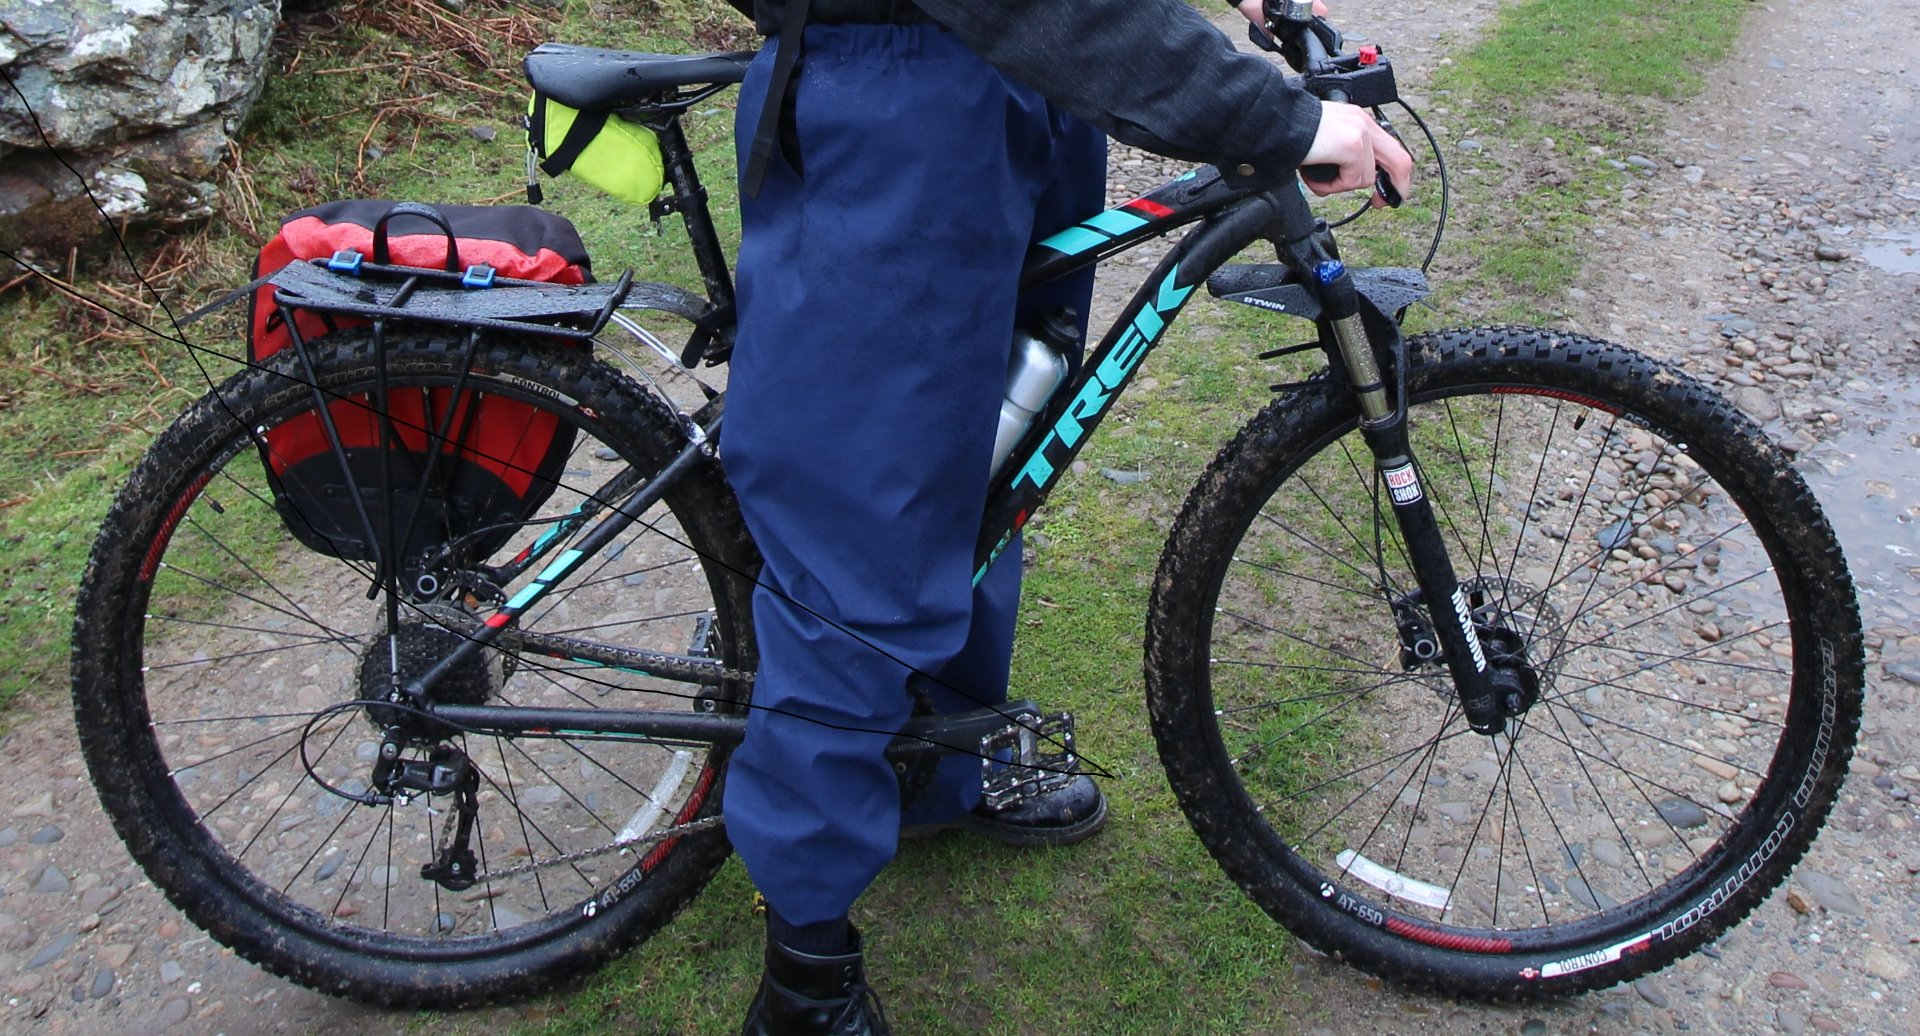 Stolen Trek X-Caliber 7 2016 mountain bike - CCTV IMAGES AND FRAME ...